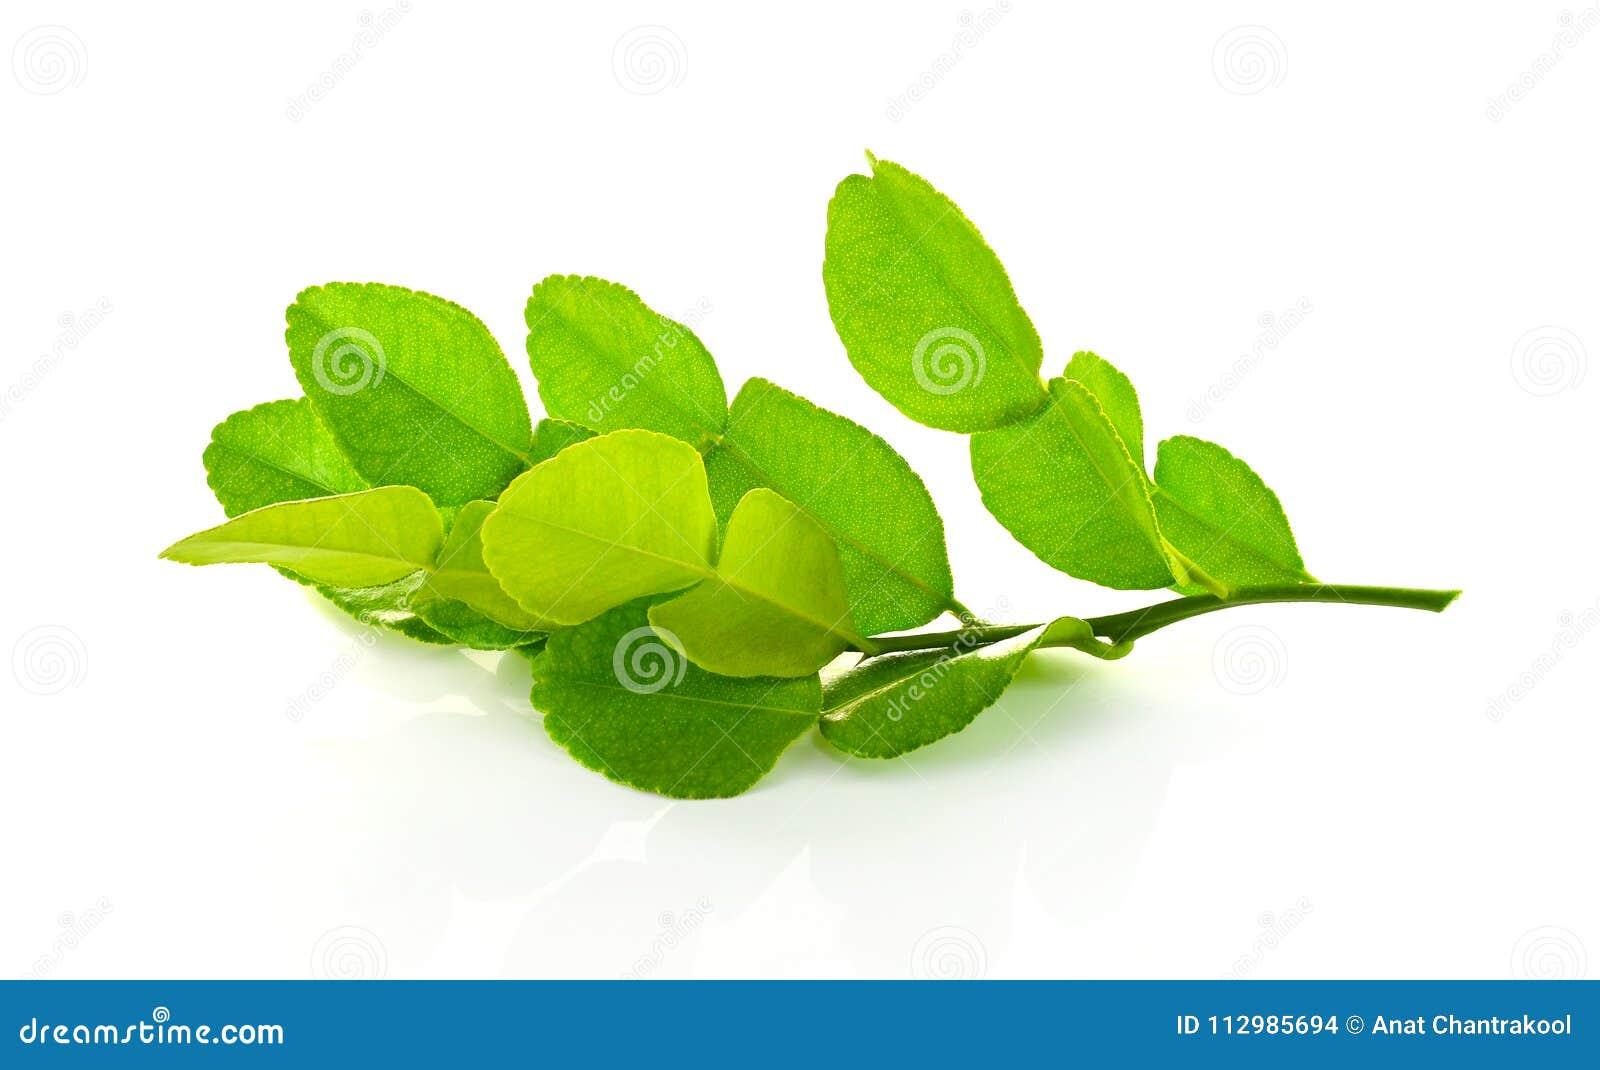 Kaffir lime leaves.